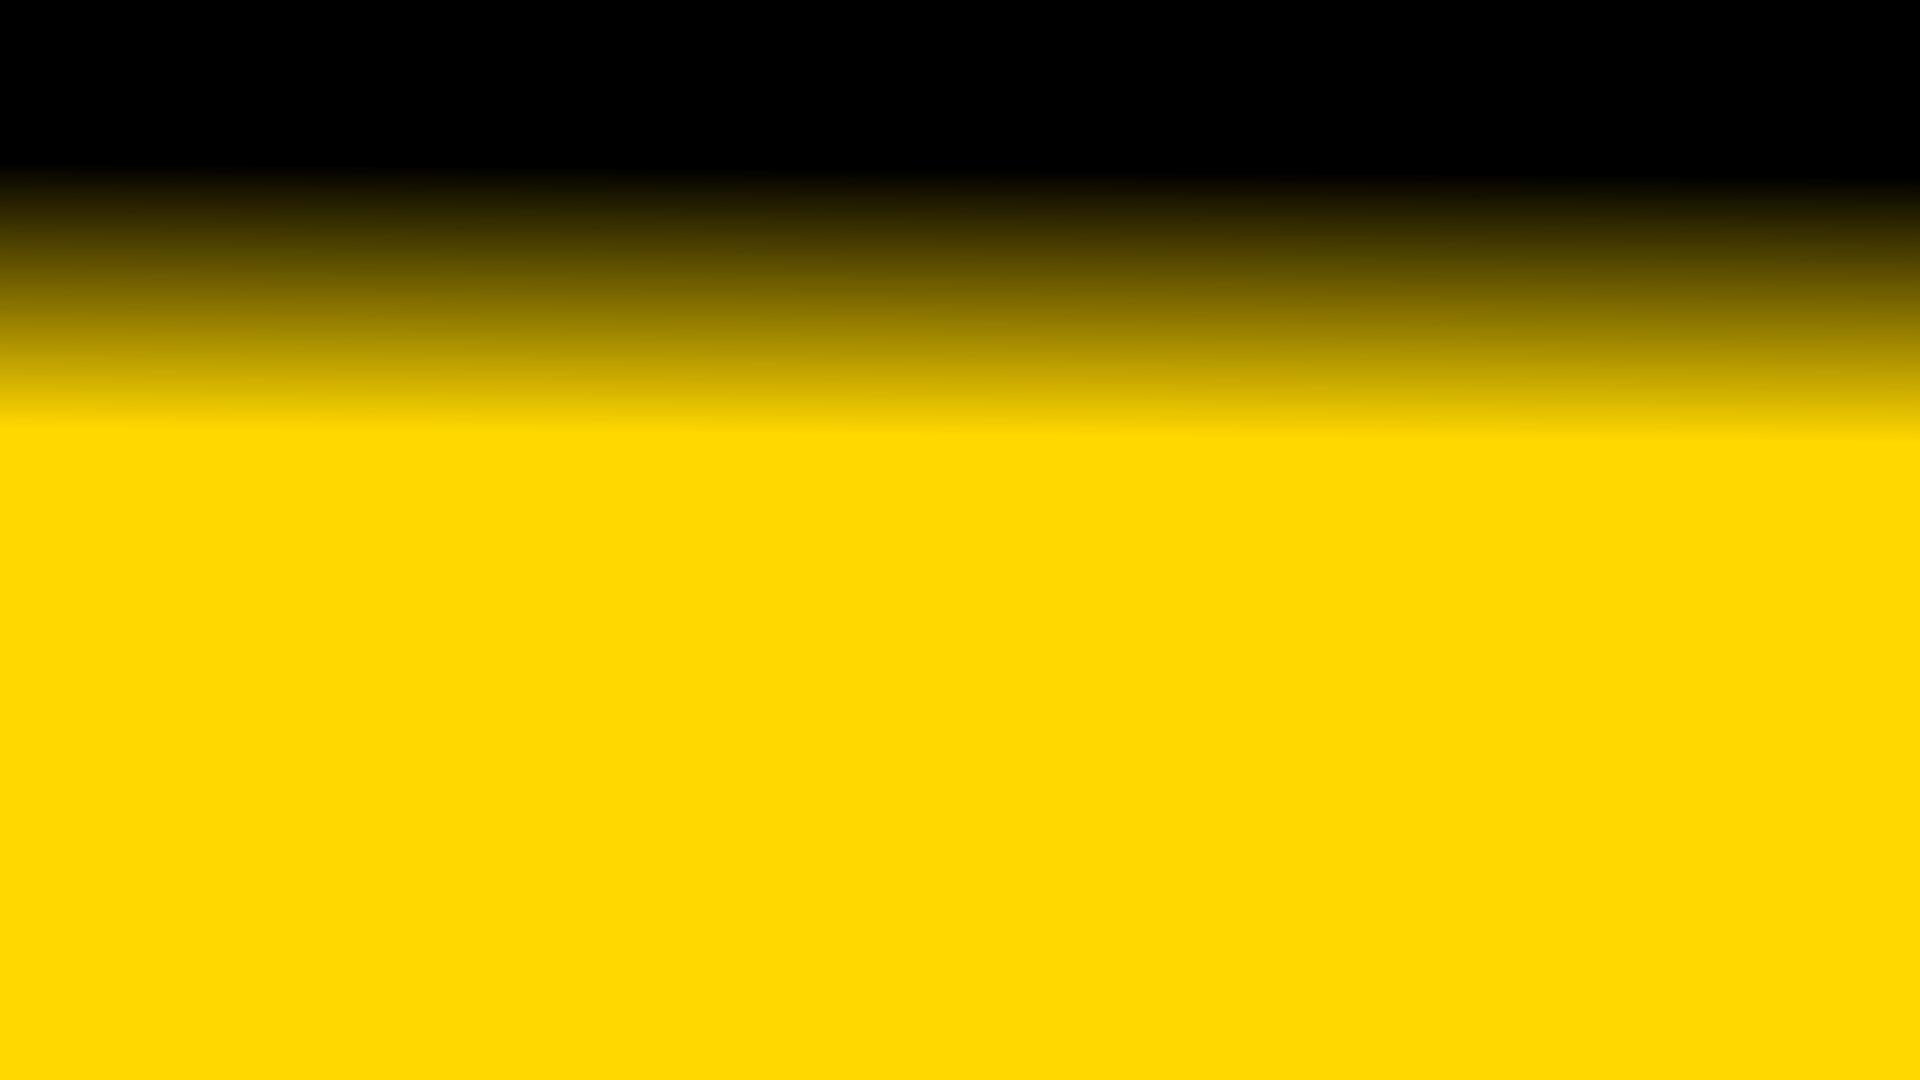 Black Yellow Wallpaper Windows T Rex Fitness